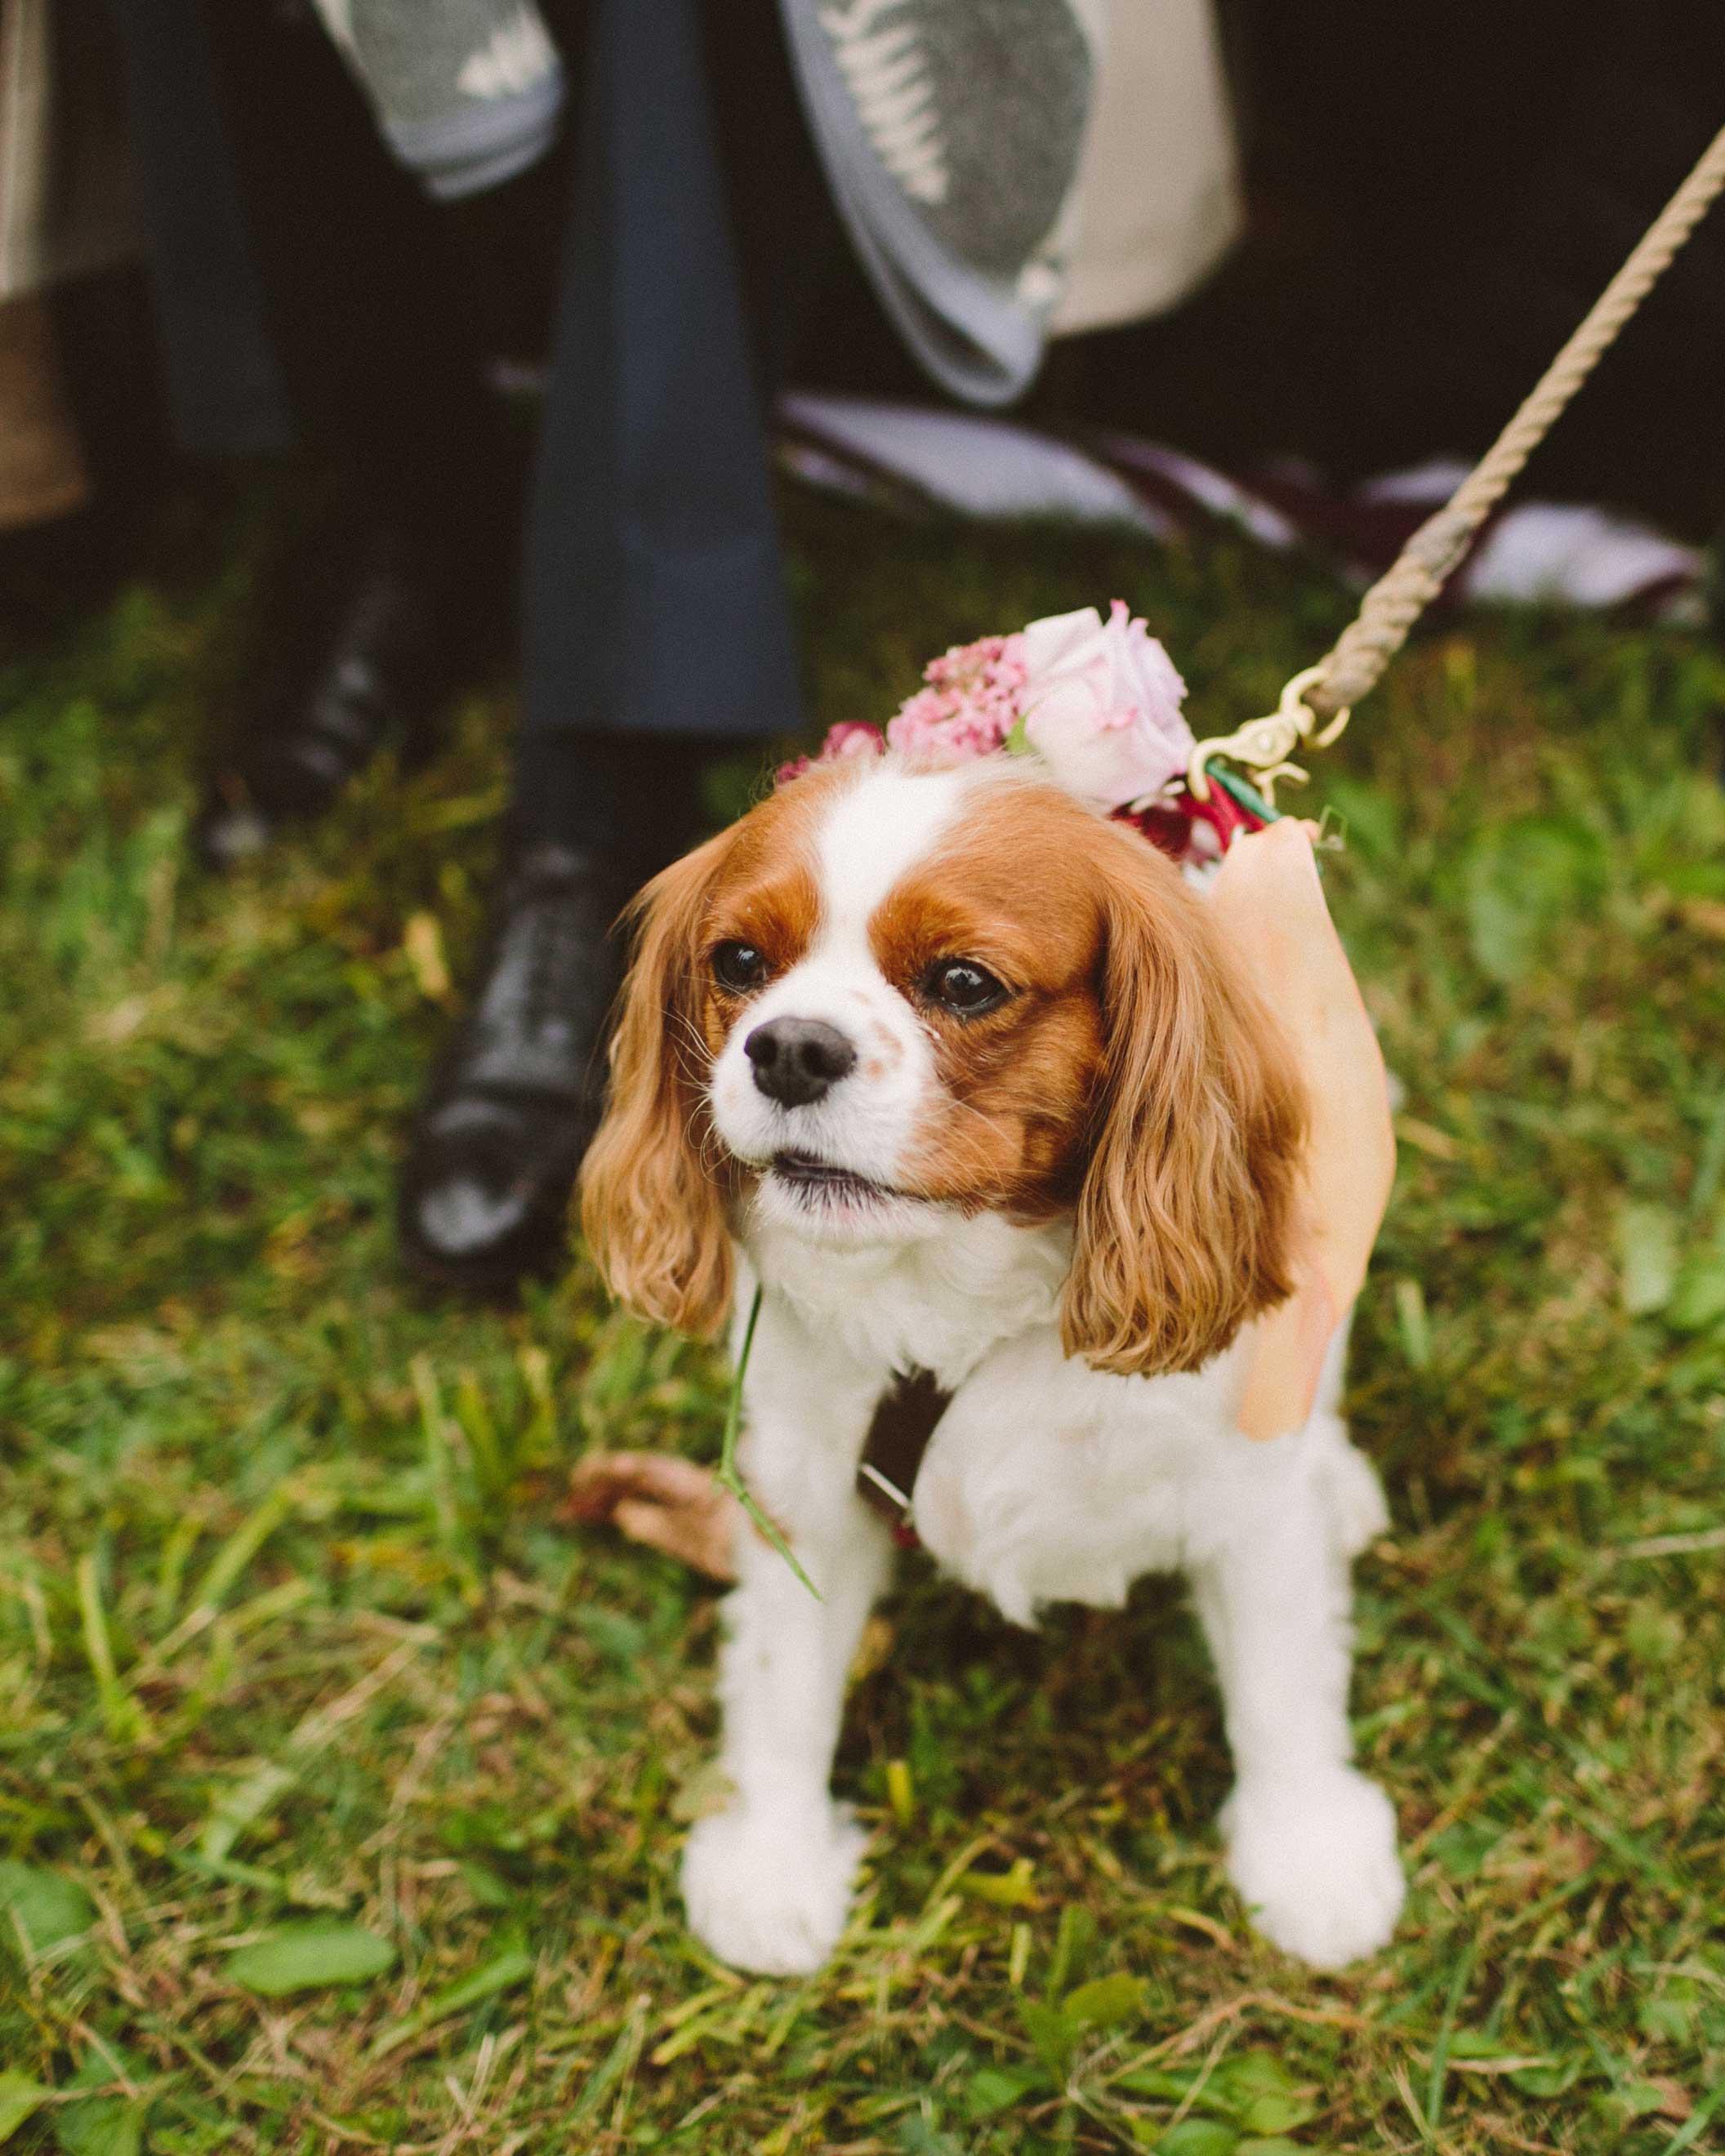 alisa-barrett-wedding-dog-558-s113048-0716.jpg